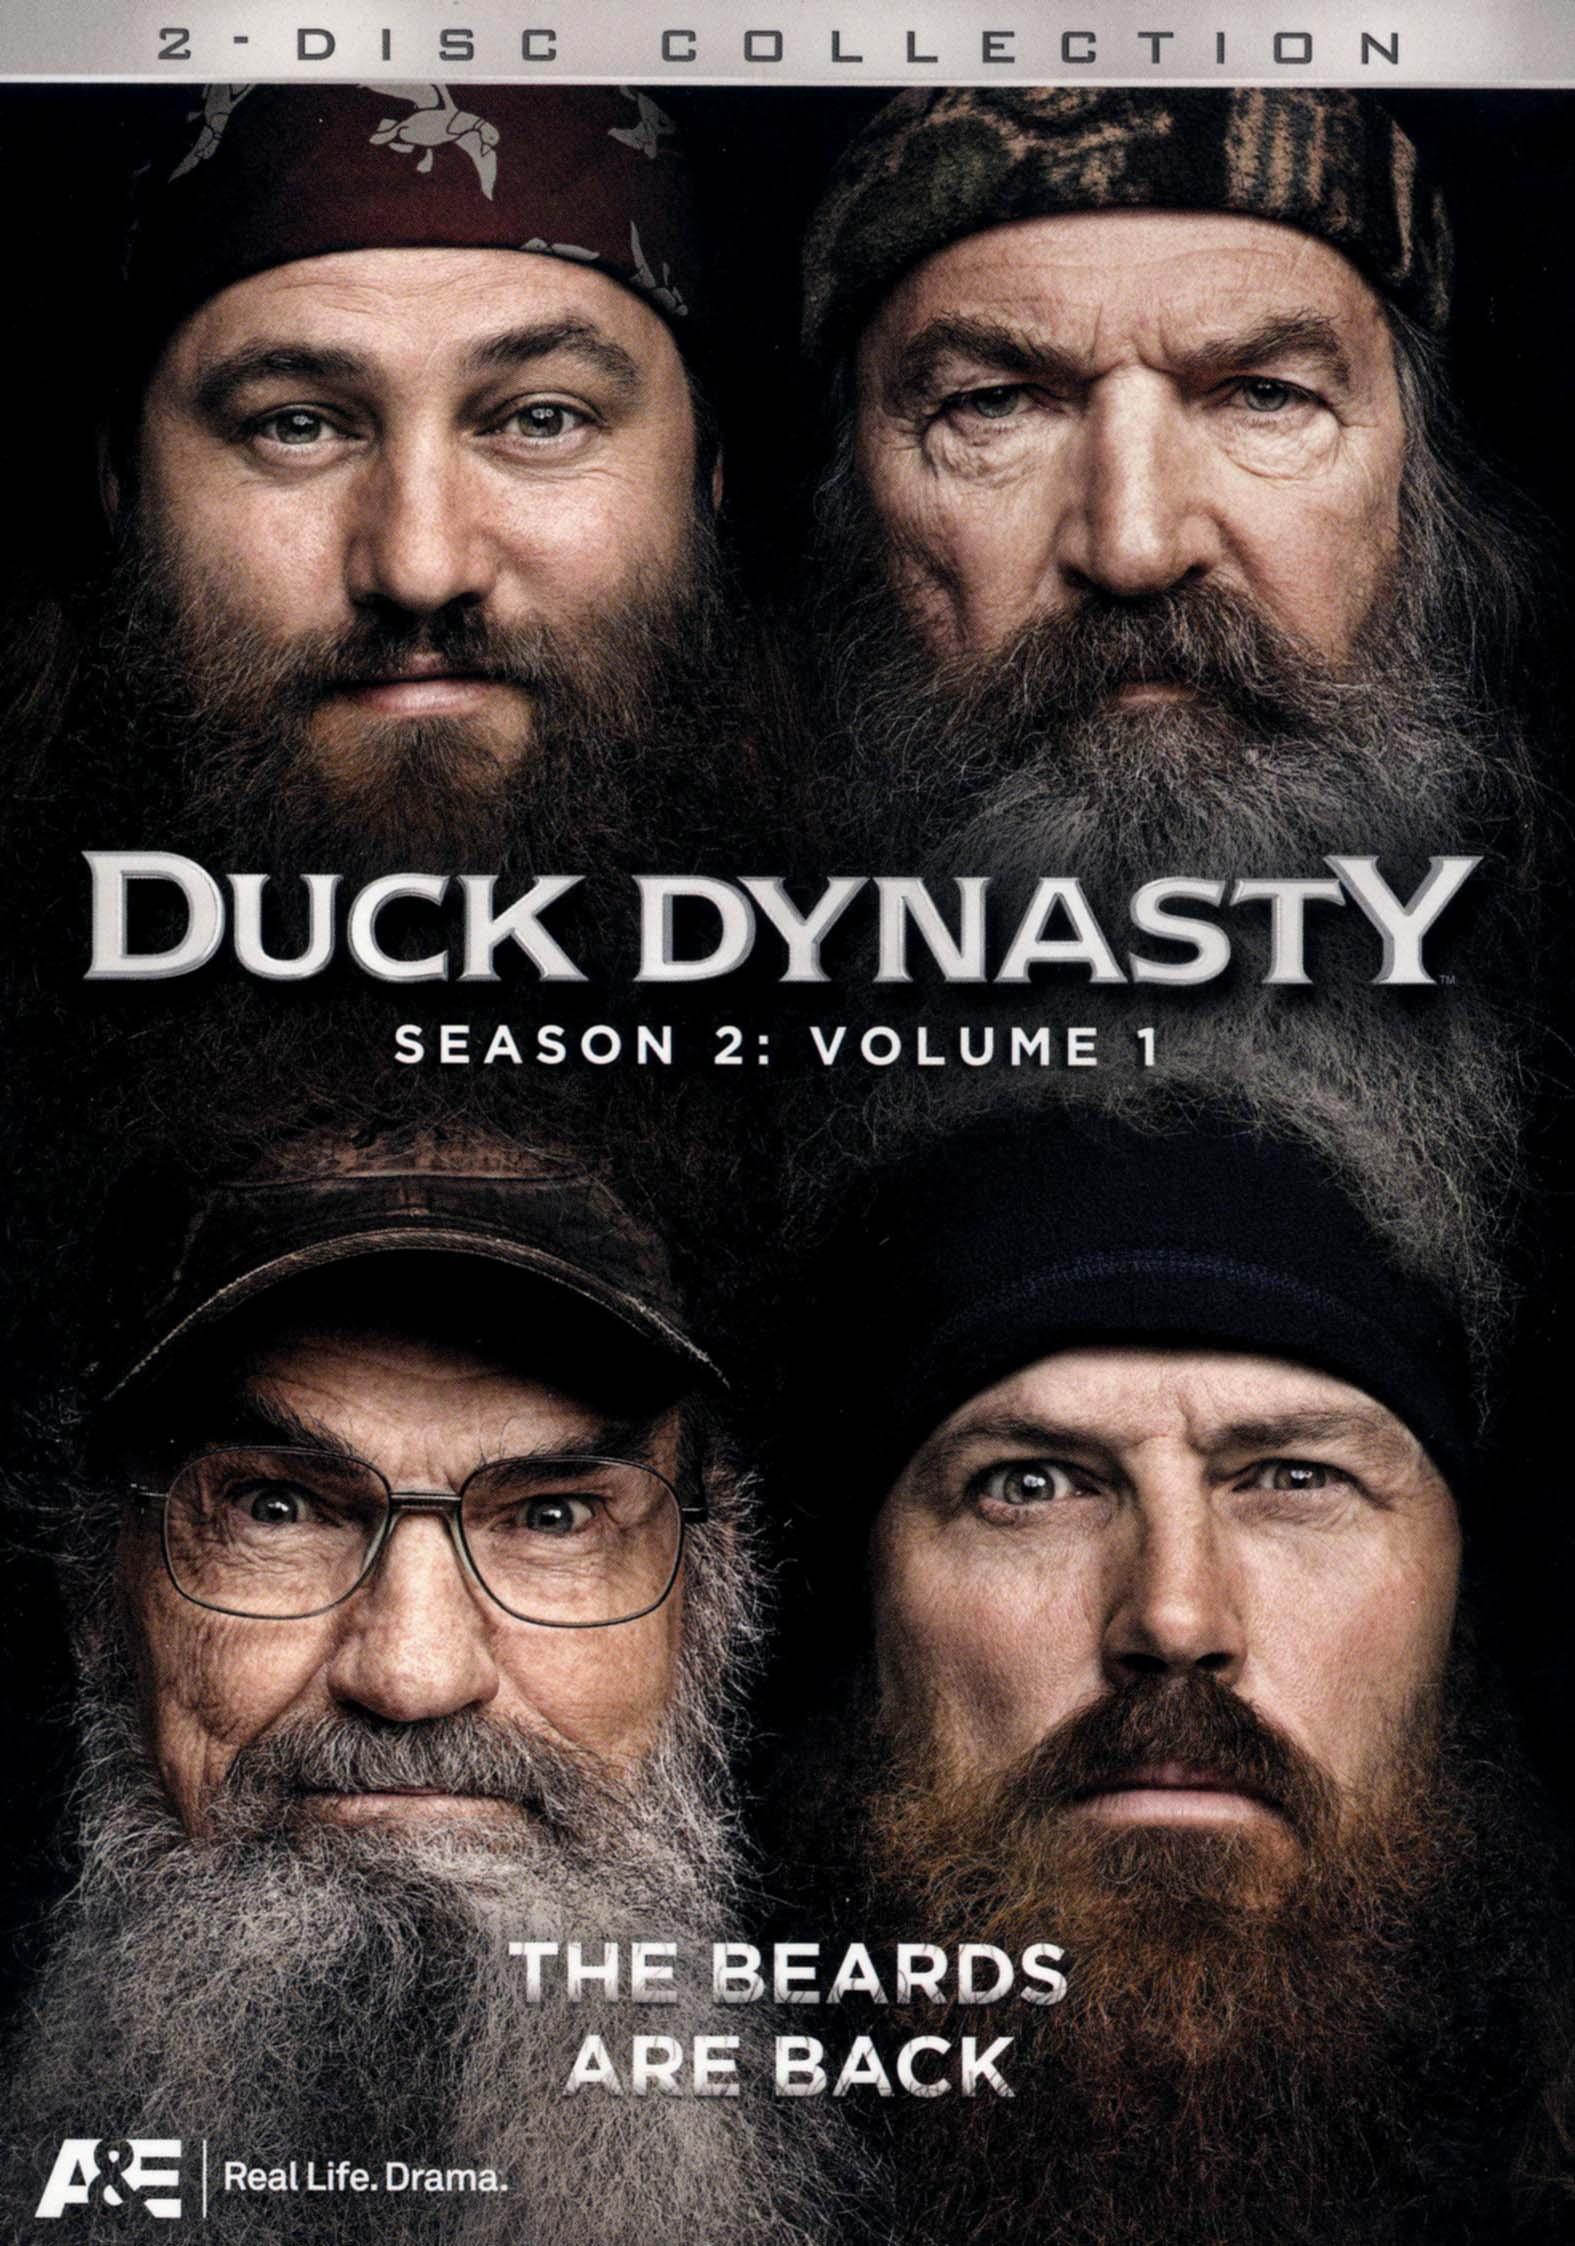 Duck Dynasty: Season 2, Vol. 1 [2 Discs] (dvd) 8237049